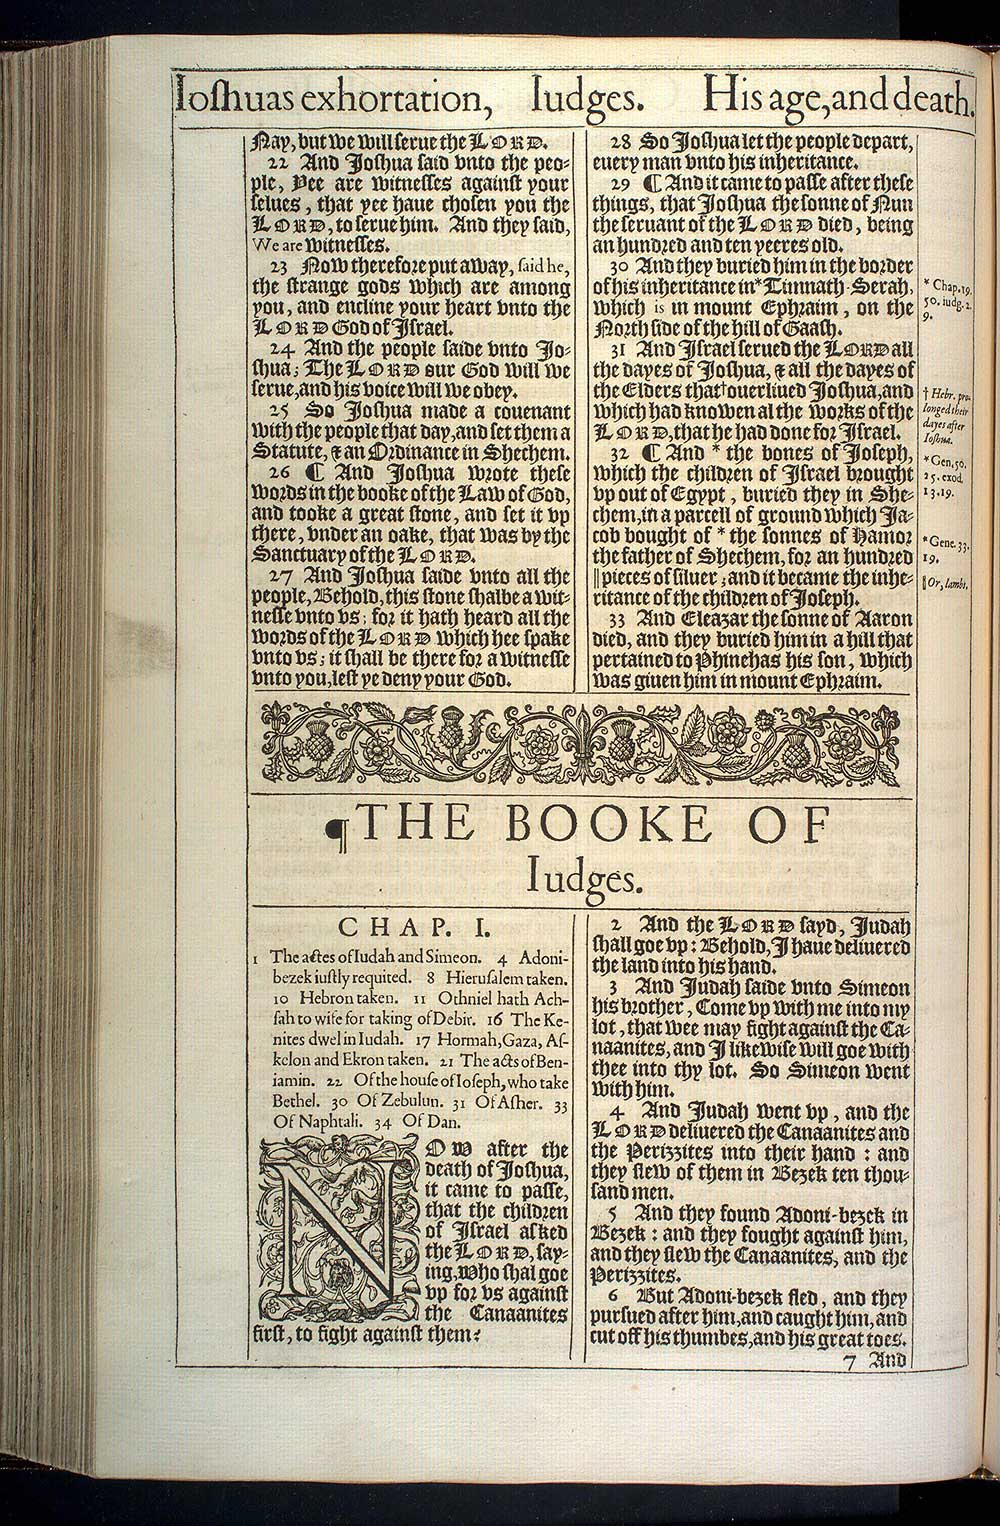 Judges Chapter 1 Original 1611 Bible Scan